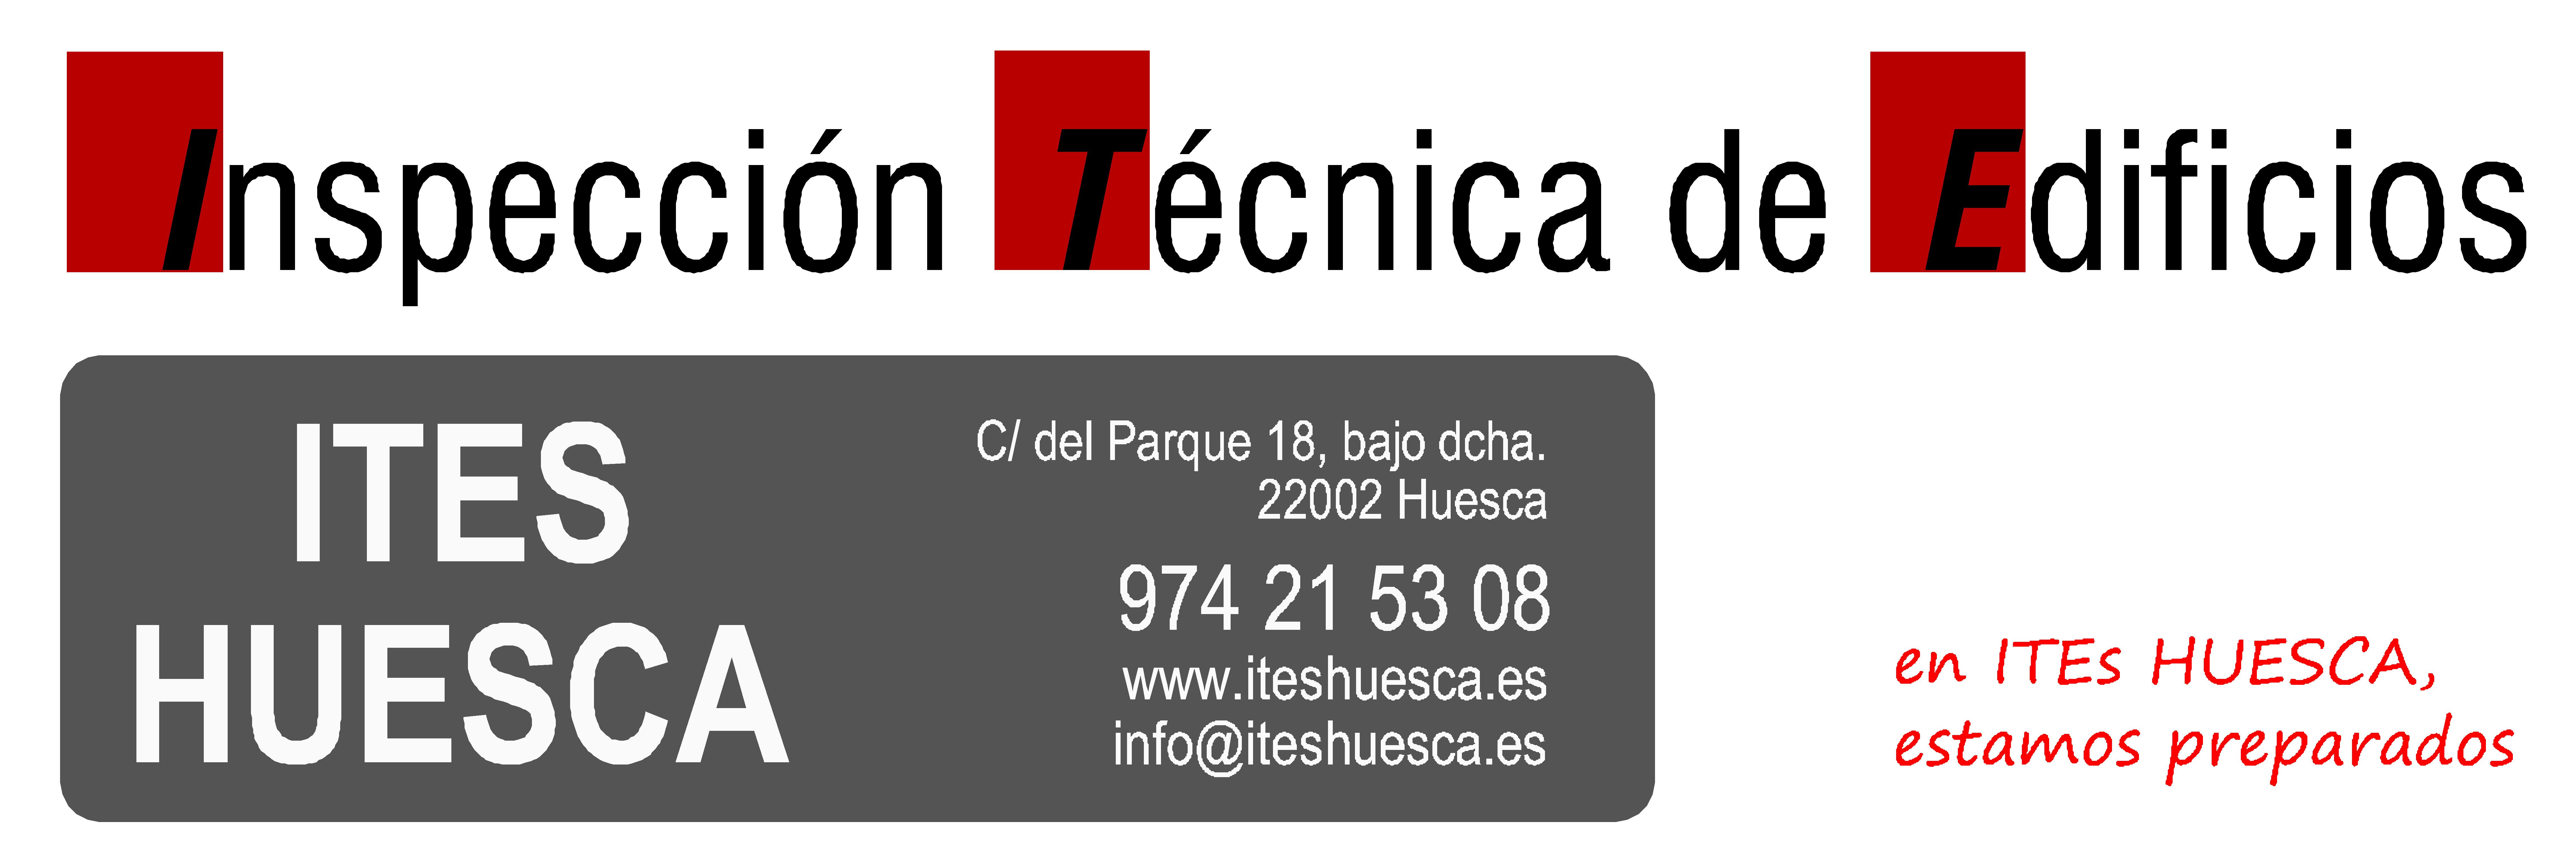 Ites Huesca